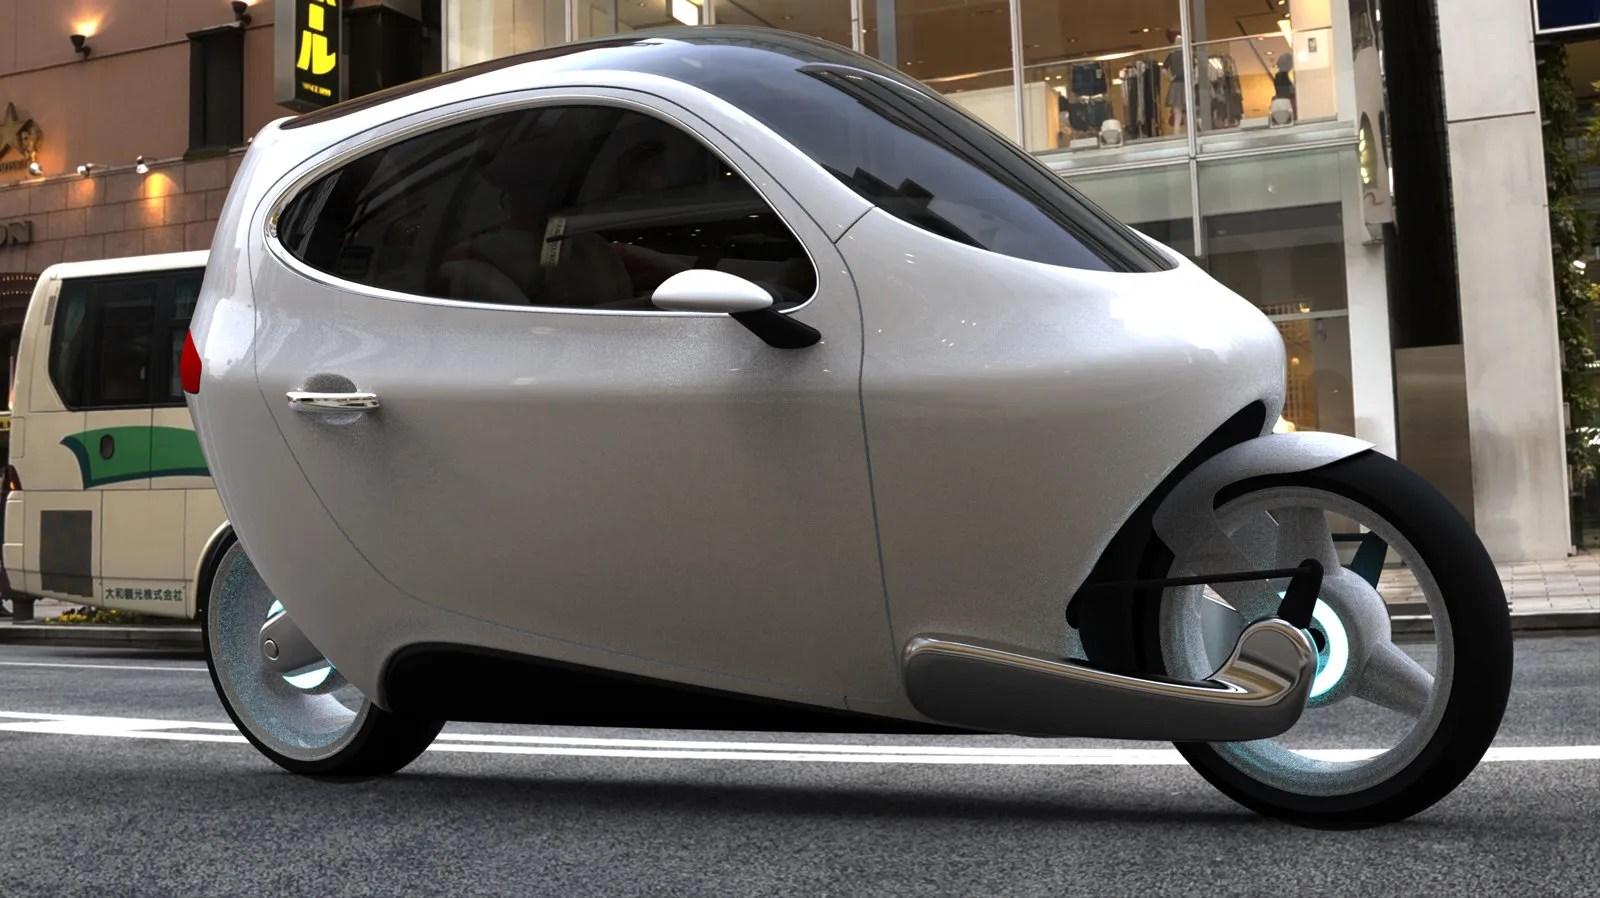 2014 Lit Motors C 1 Picture 478731 Car Review Top Speed